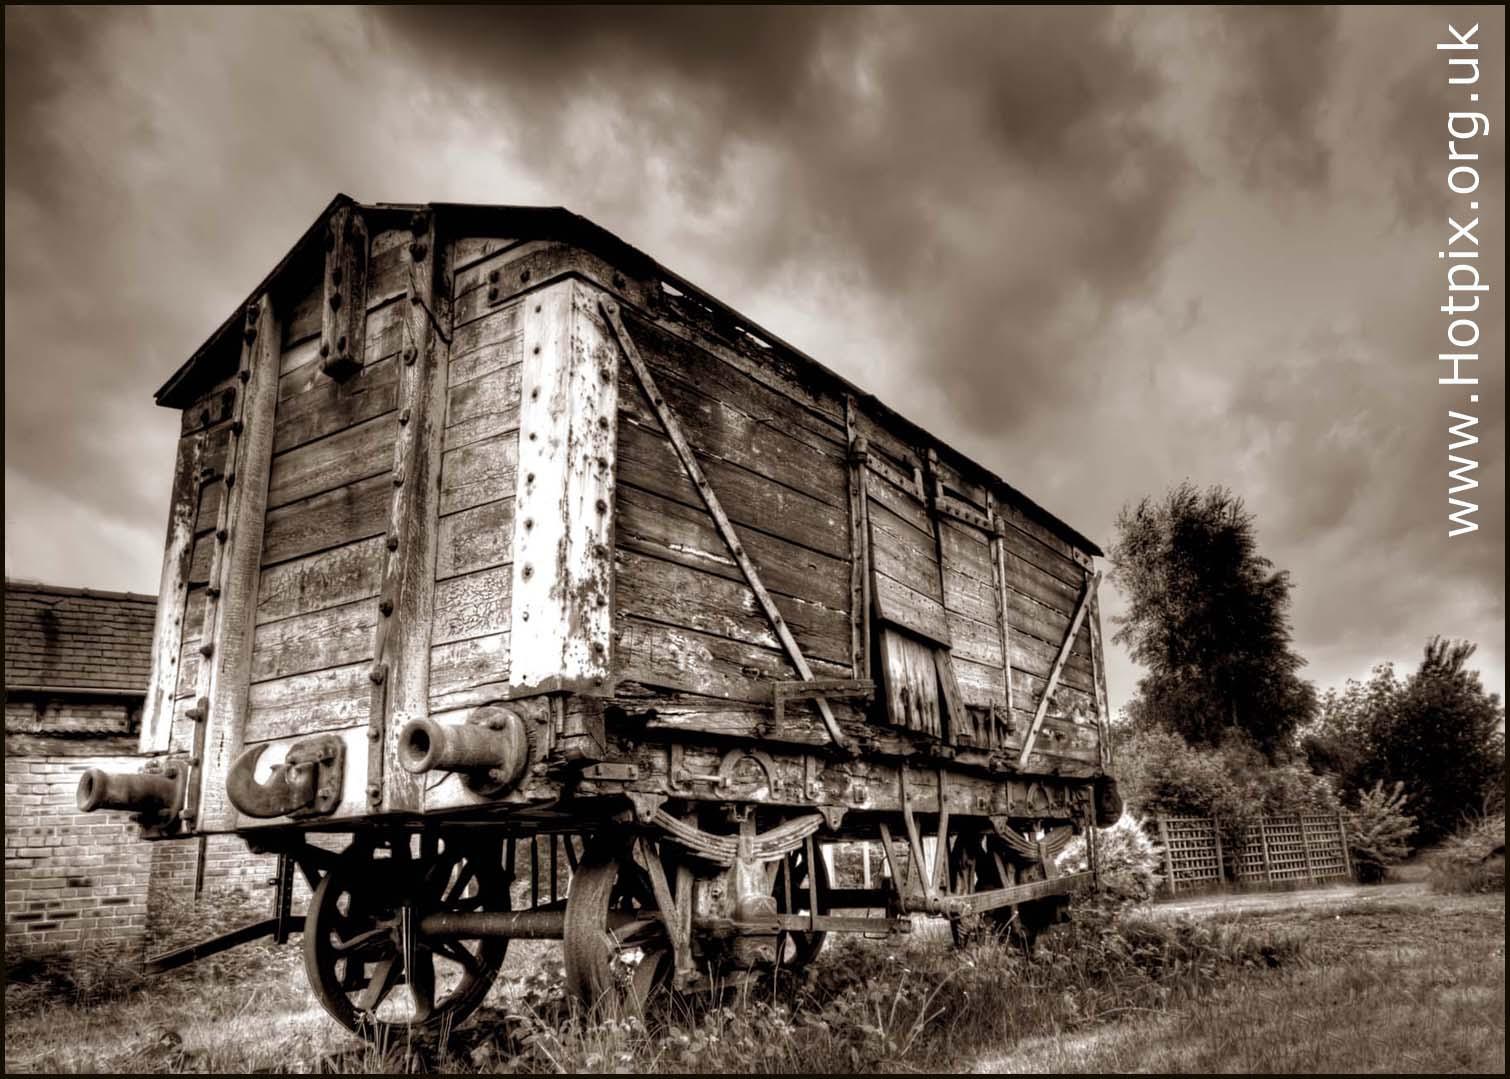 Salt Van,lion salt works,Marston,Northwich,Cheshire,salt,wagon,van,village,rail,railway,track,tracks,wood,buffers,railroad,road,old,decaying,texture,textured,transport,rusting,rusted,black,white,sepia,toned,monochrome,preservation,lion,works,UK,GB,britain,England,wich,town,towns,tourist,attraction,hotpix,hotpixuk,tonysmith,tony,smith,wooden,this photo rocks,B/W,mono,HDR,high dynamic range,#TonySmithHotpix